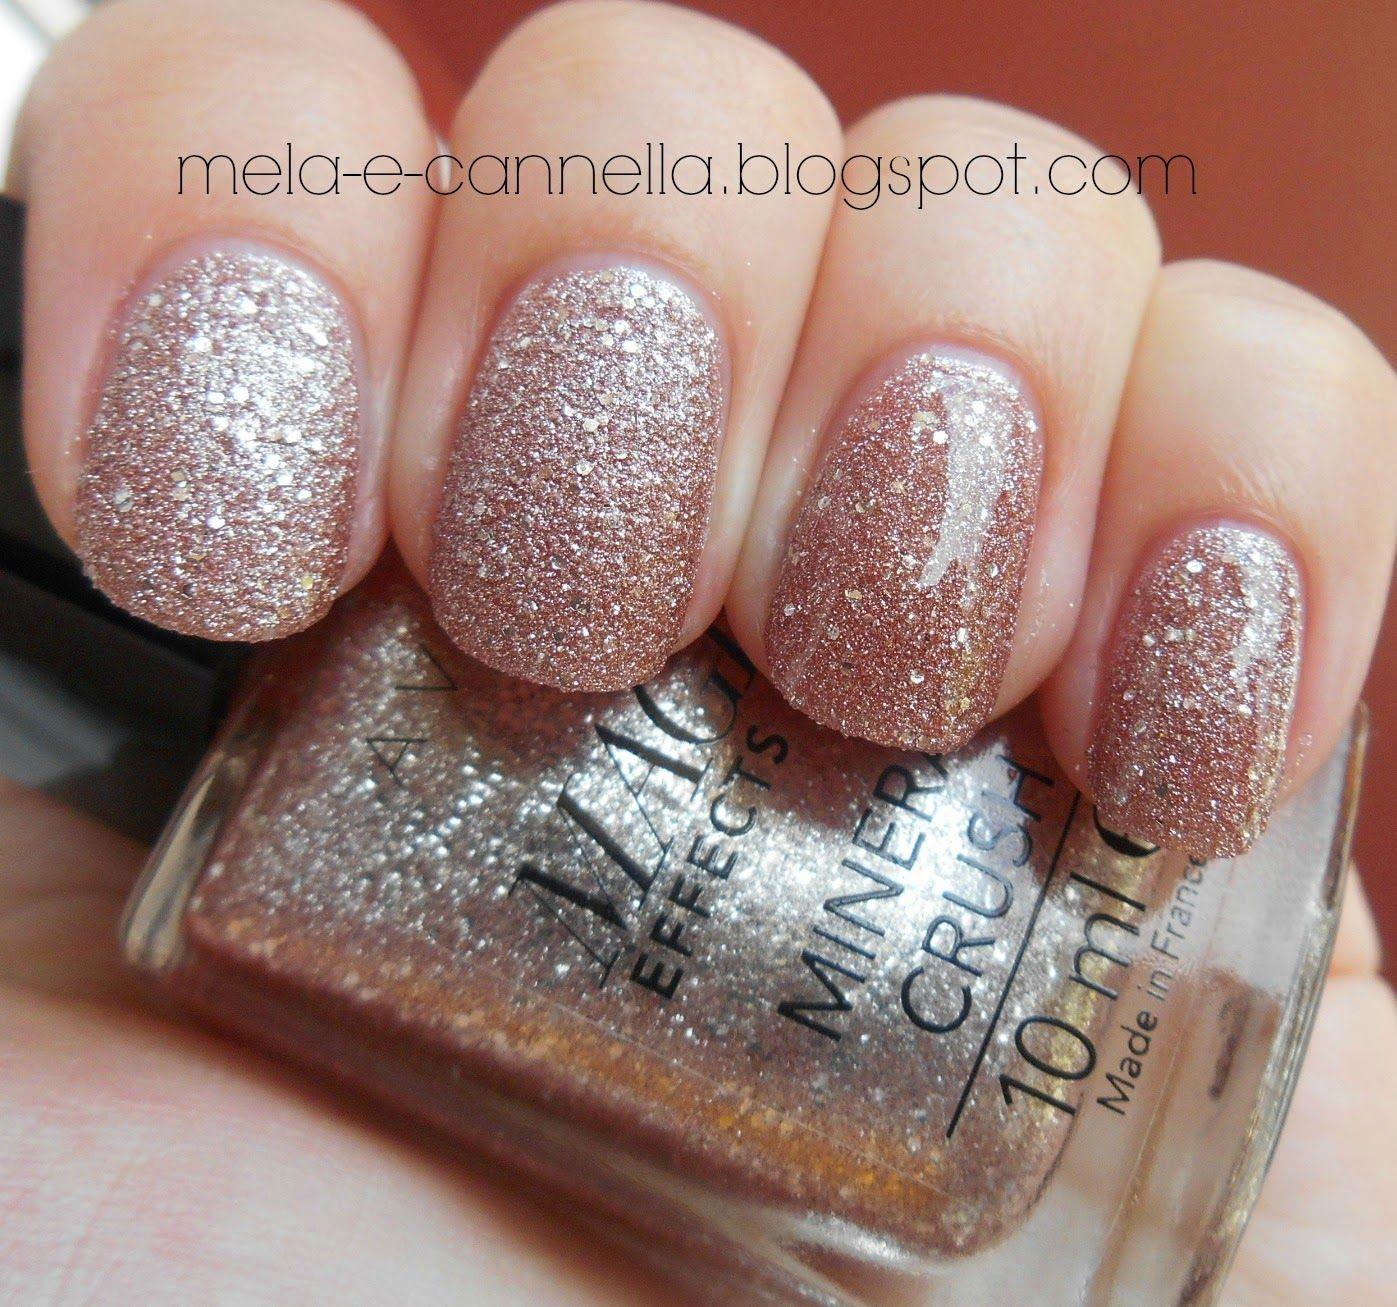 mela-e-cannella: Avon Magic Effects - Mineral Crush nail polish ...